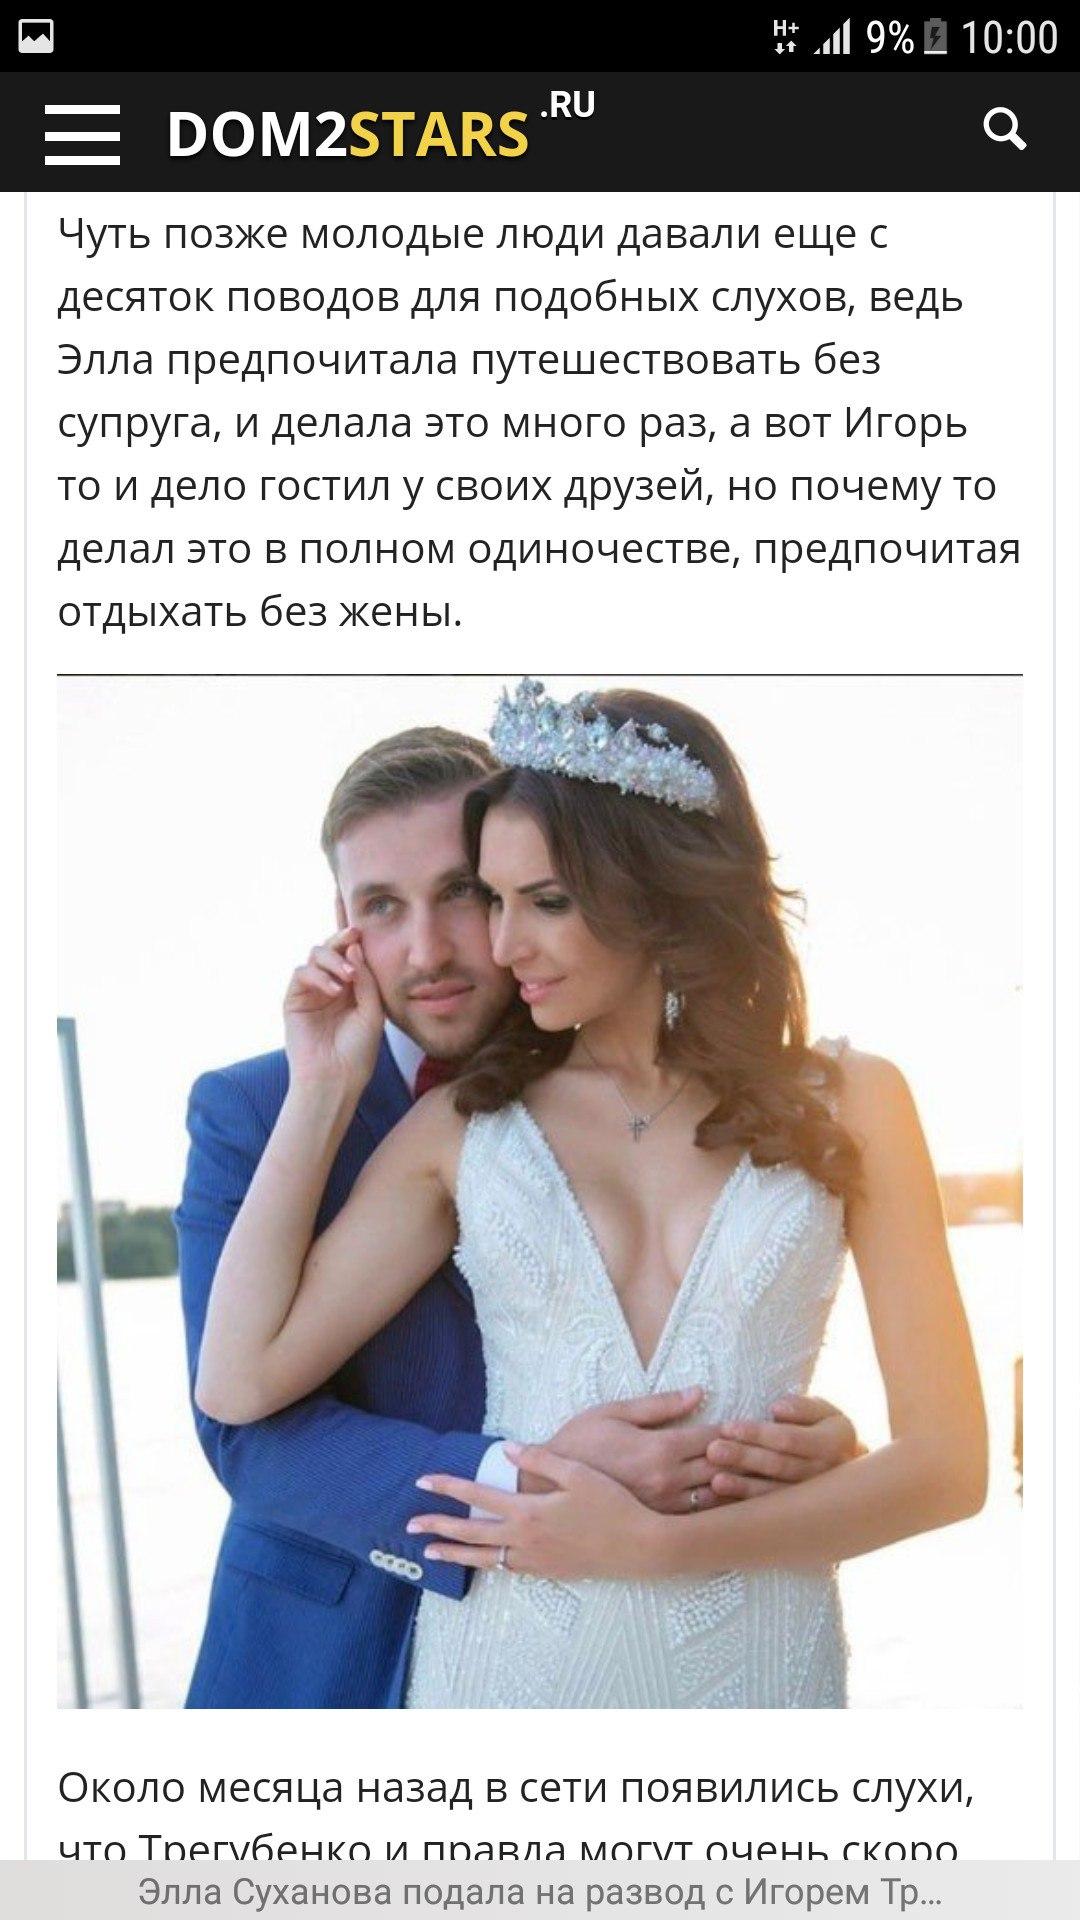 https://pp.userapi.com/c621515/v621515716/41a15/VC38B6wDk1E.jpg